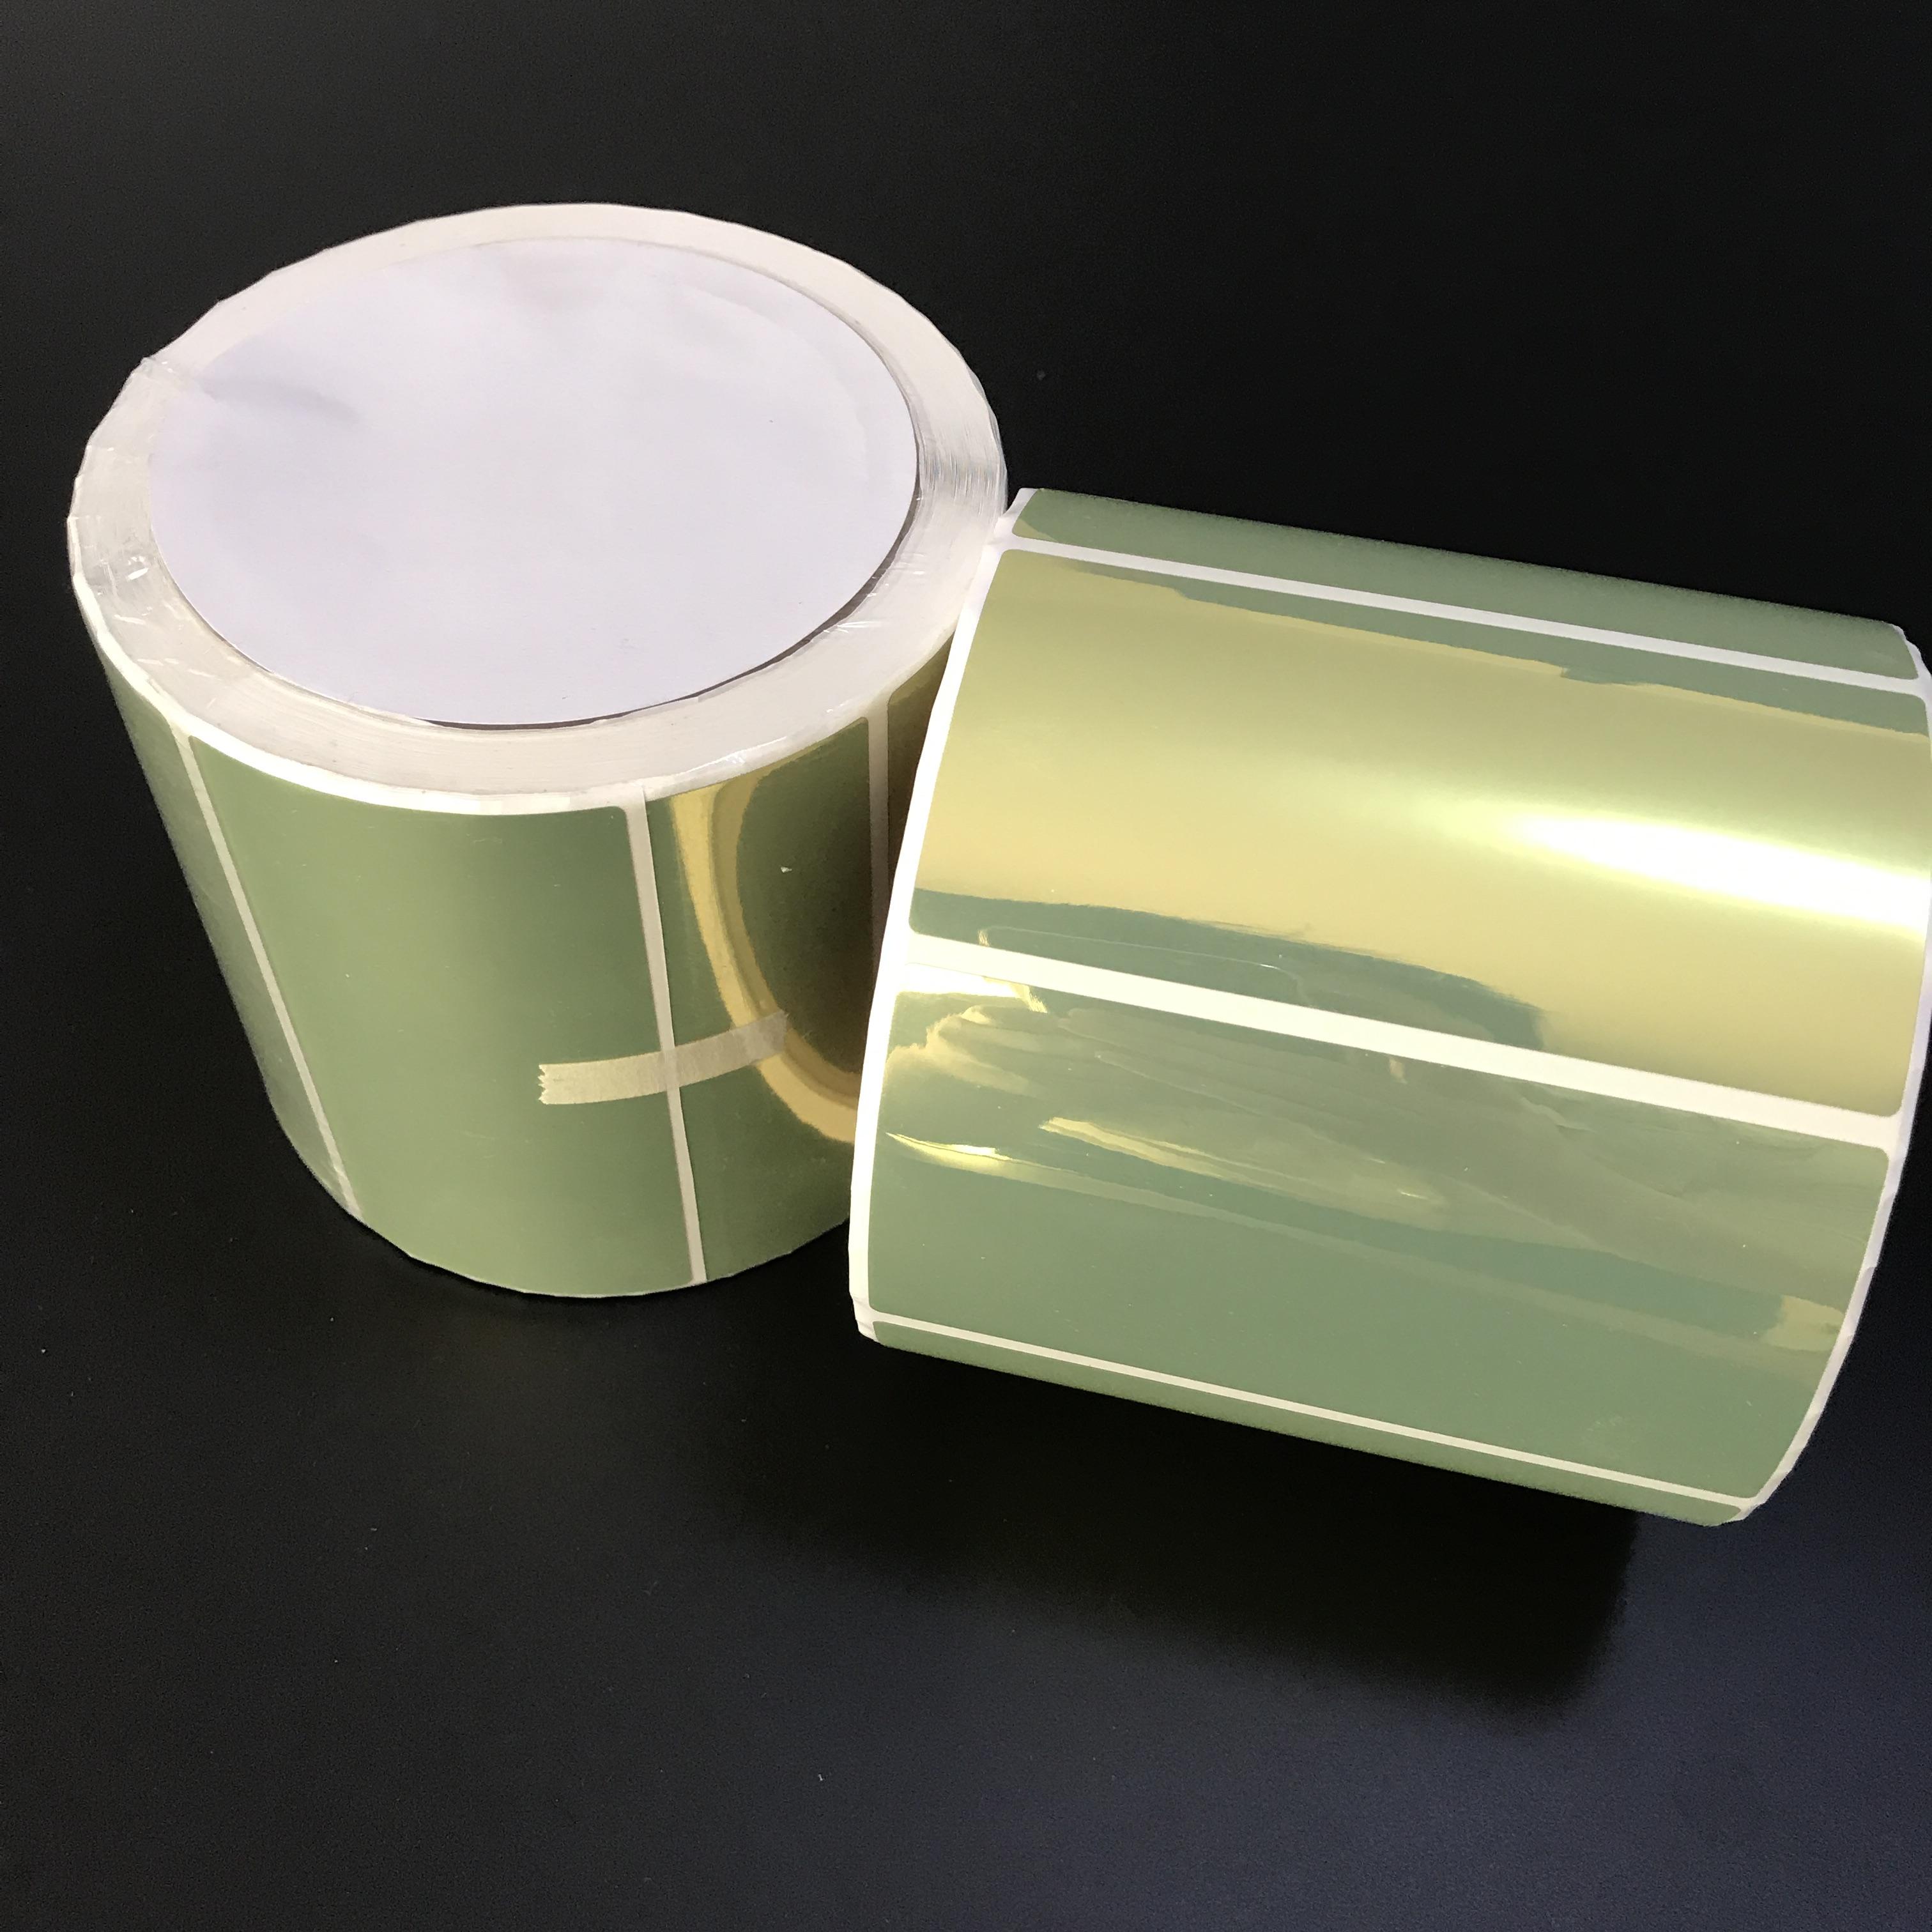 Glossy Golden Inkjet Label For Primera  Lx400,Lx500,Lx900,Lx2000,Tm-3500,C7500,Vp700,Afinia L801 - Buy Gold Inkjet  Label Roll Neuralabel 300x,Golden